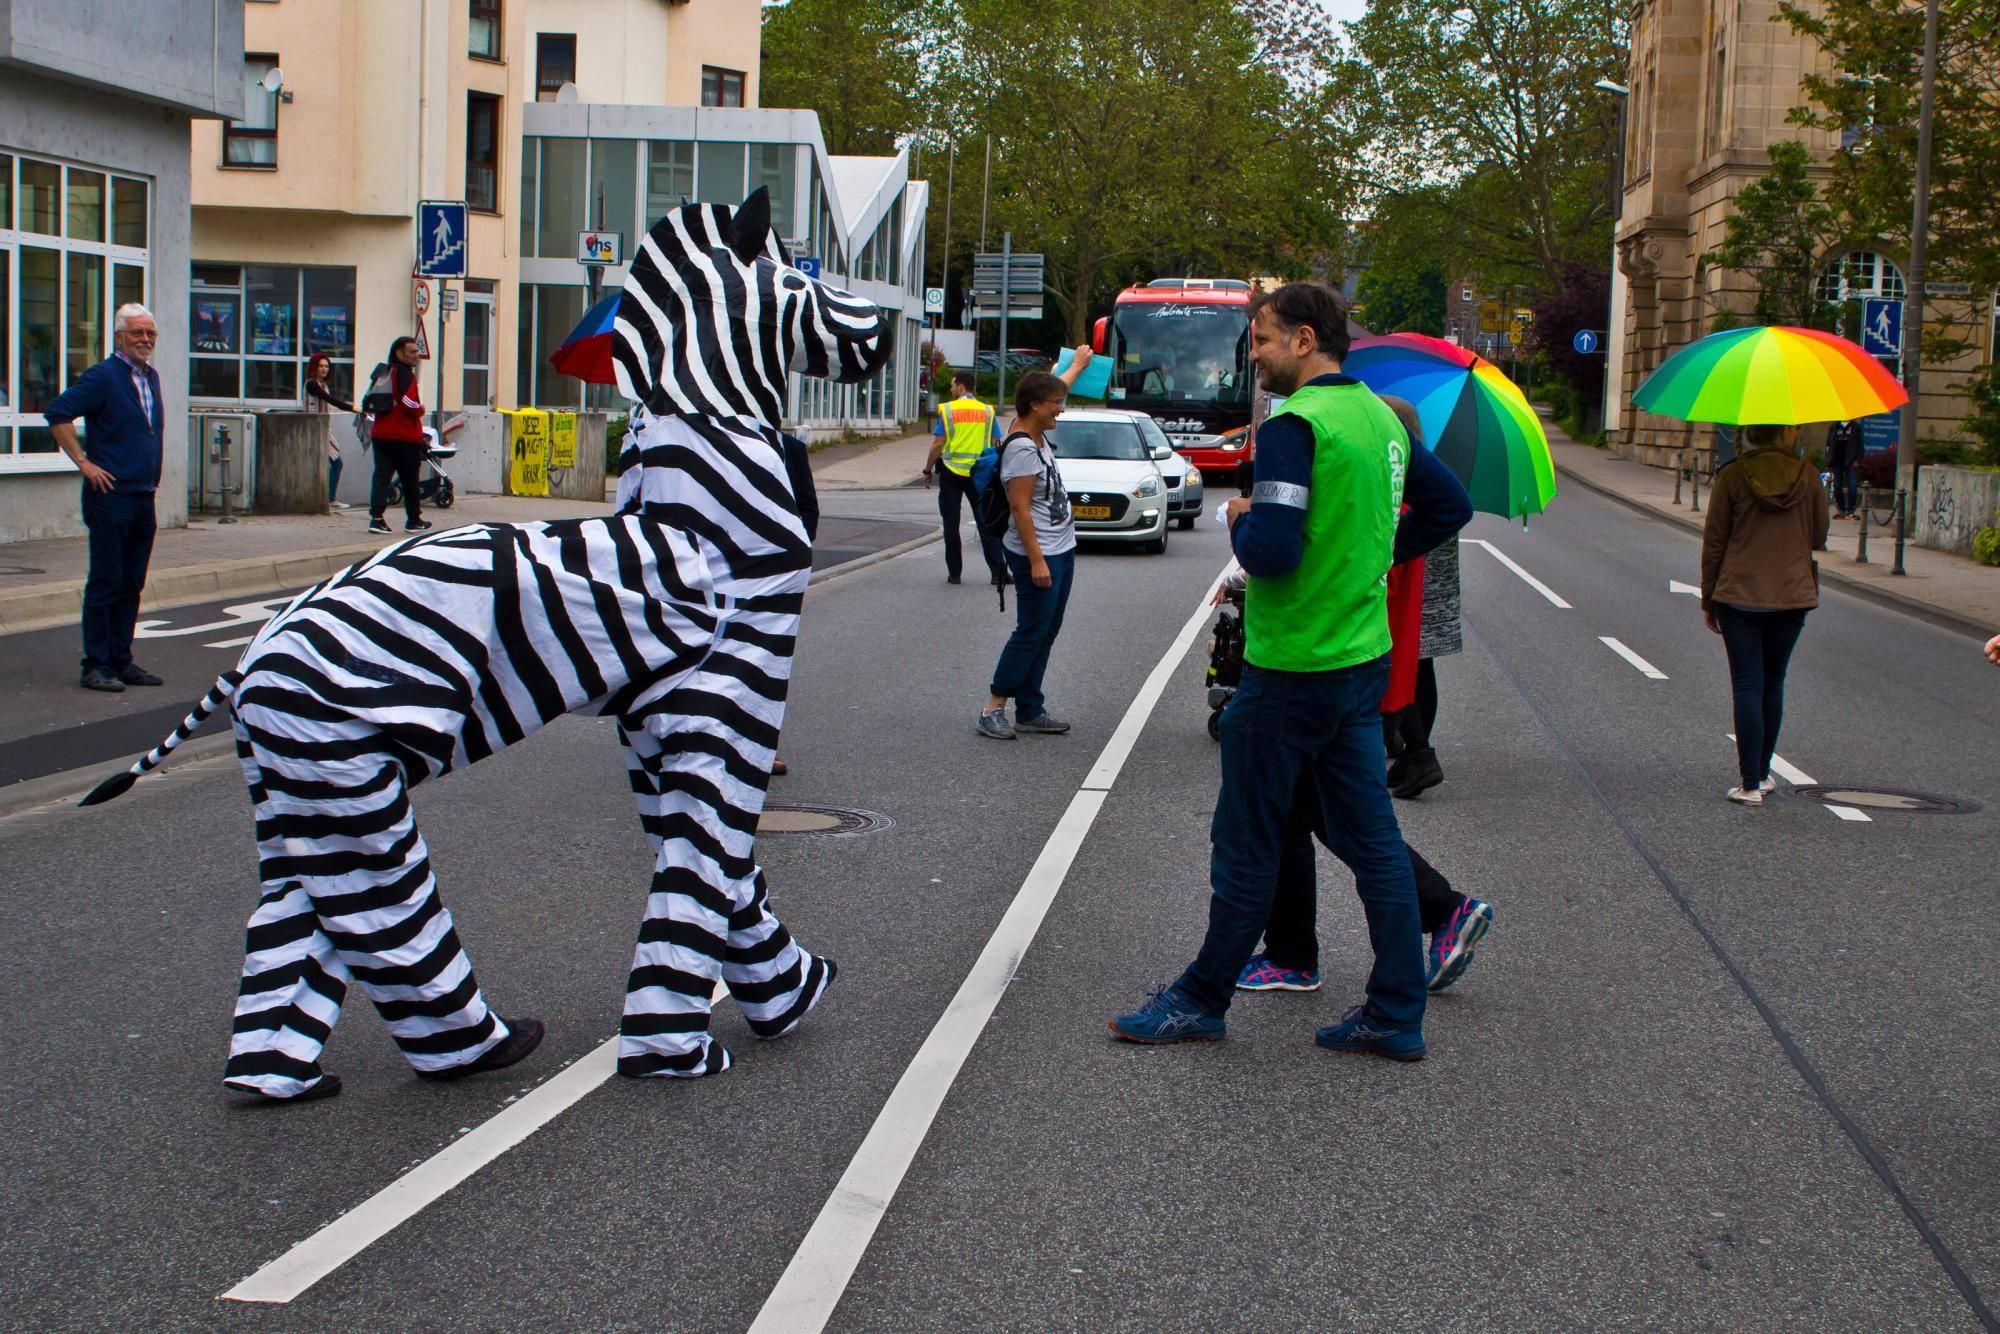 Verkehrsclub Fordert hürdenlose Innenstadt in Bad Kreuznach